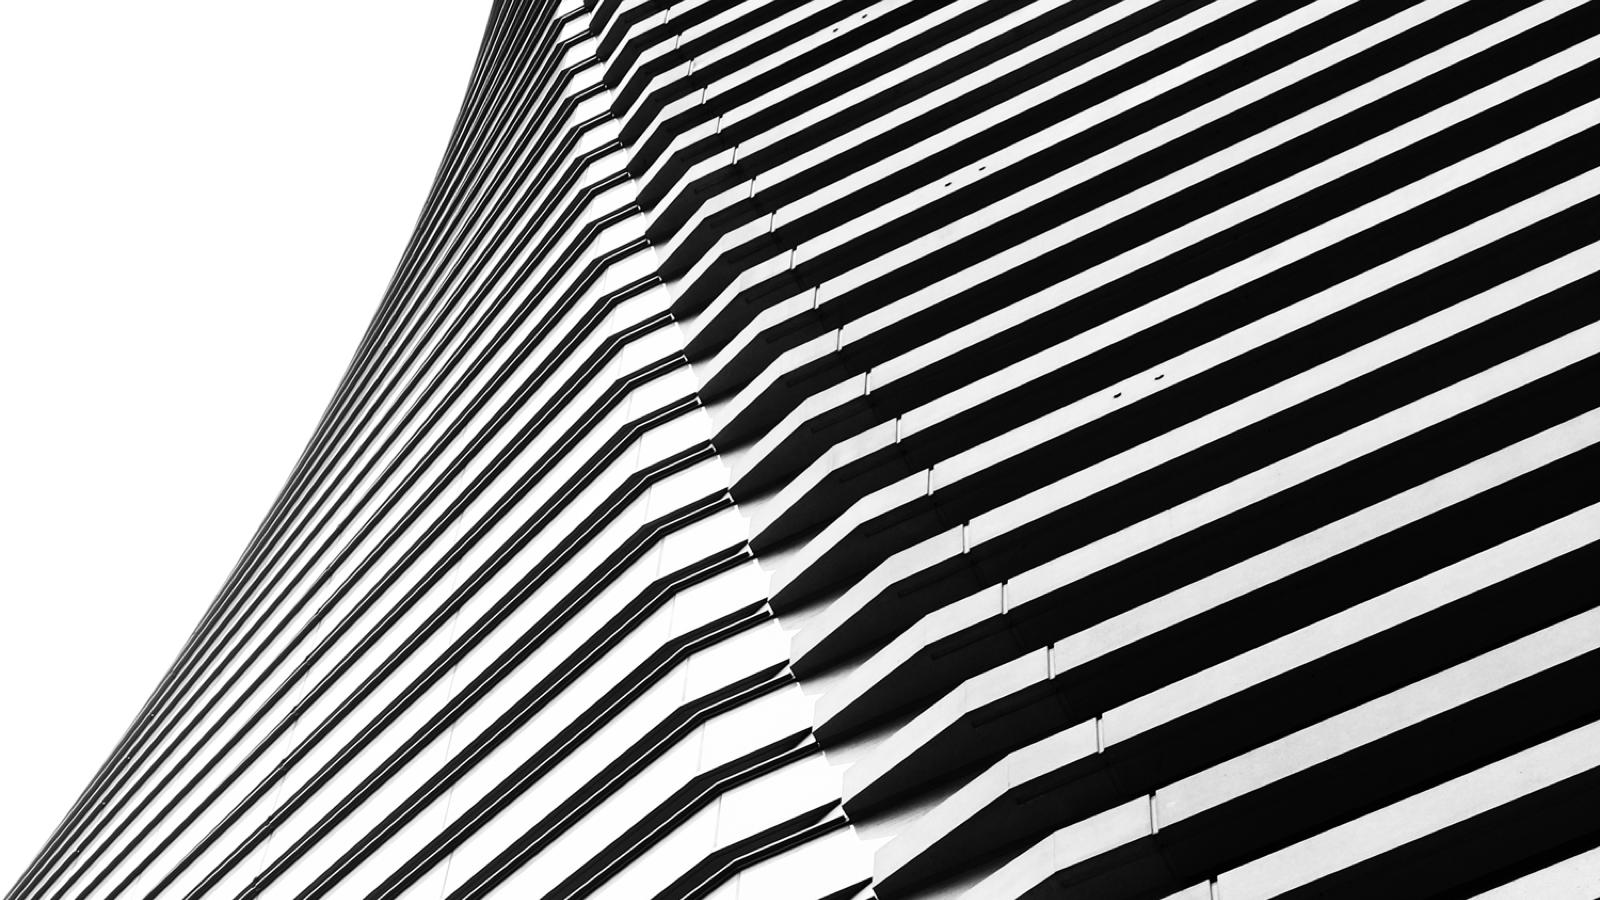 Digital Photography: Tokyo-1 Series